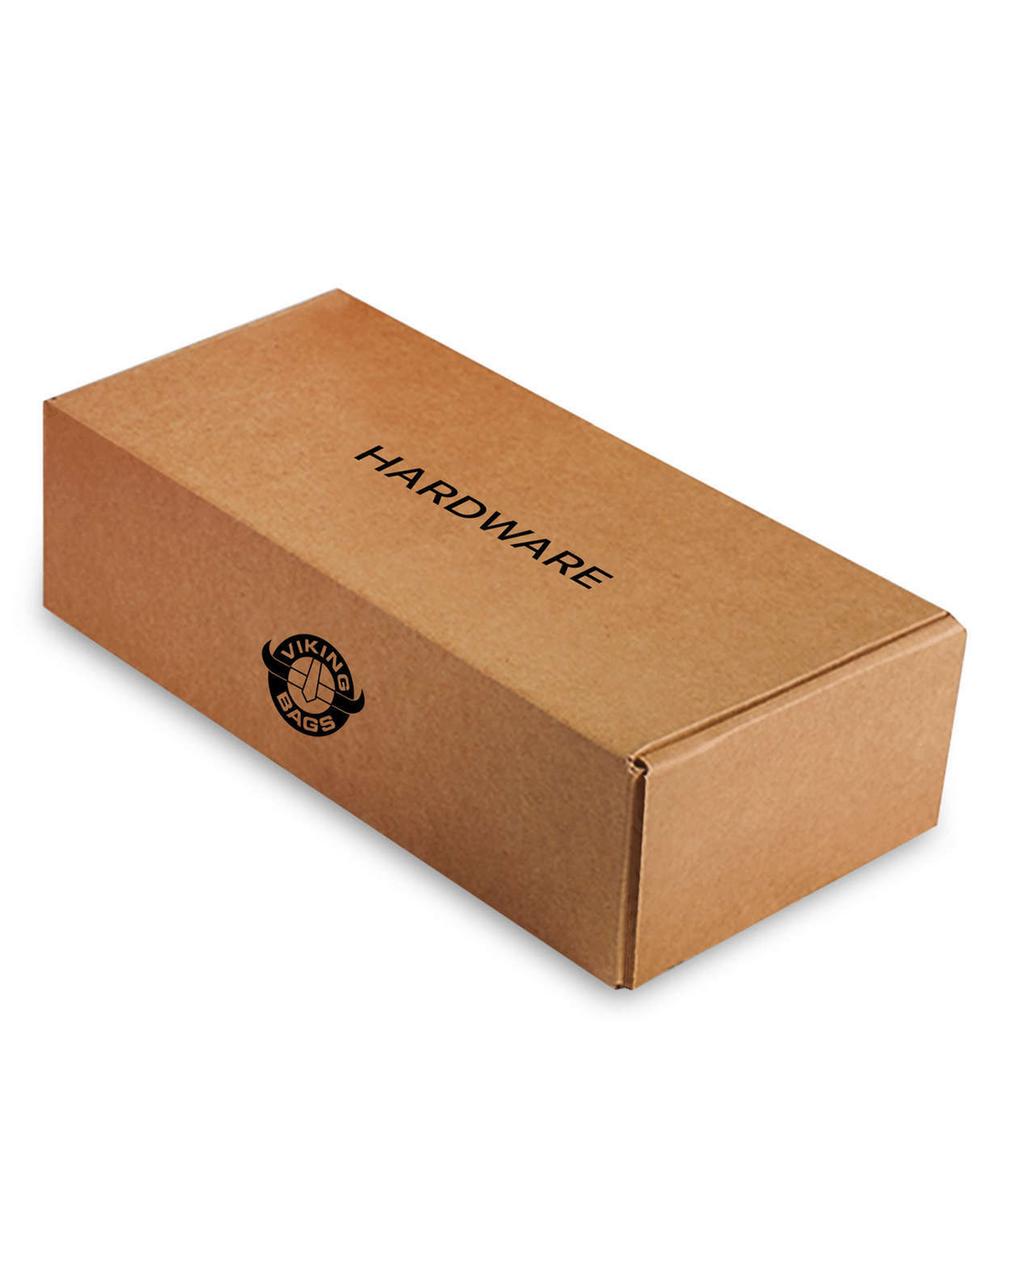 Honda 1500 Valkyrie Standard Slanted Studded M Motorcycle saddlebags Box